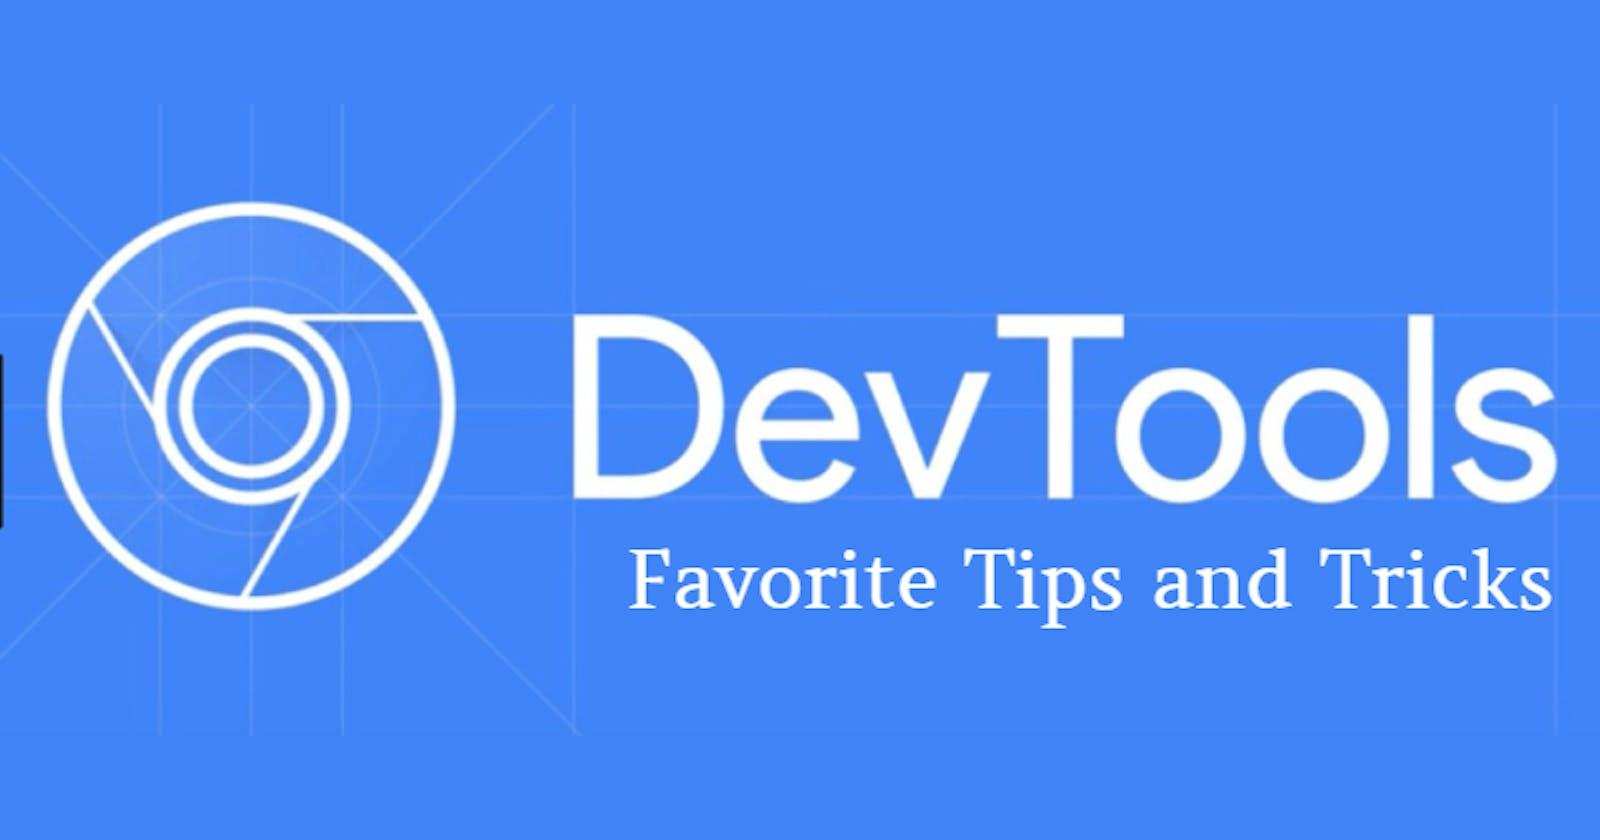 DevTools - My Favorite Tips and Tricks